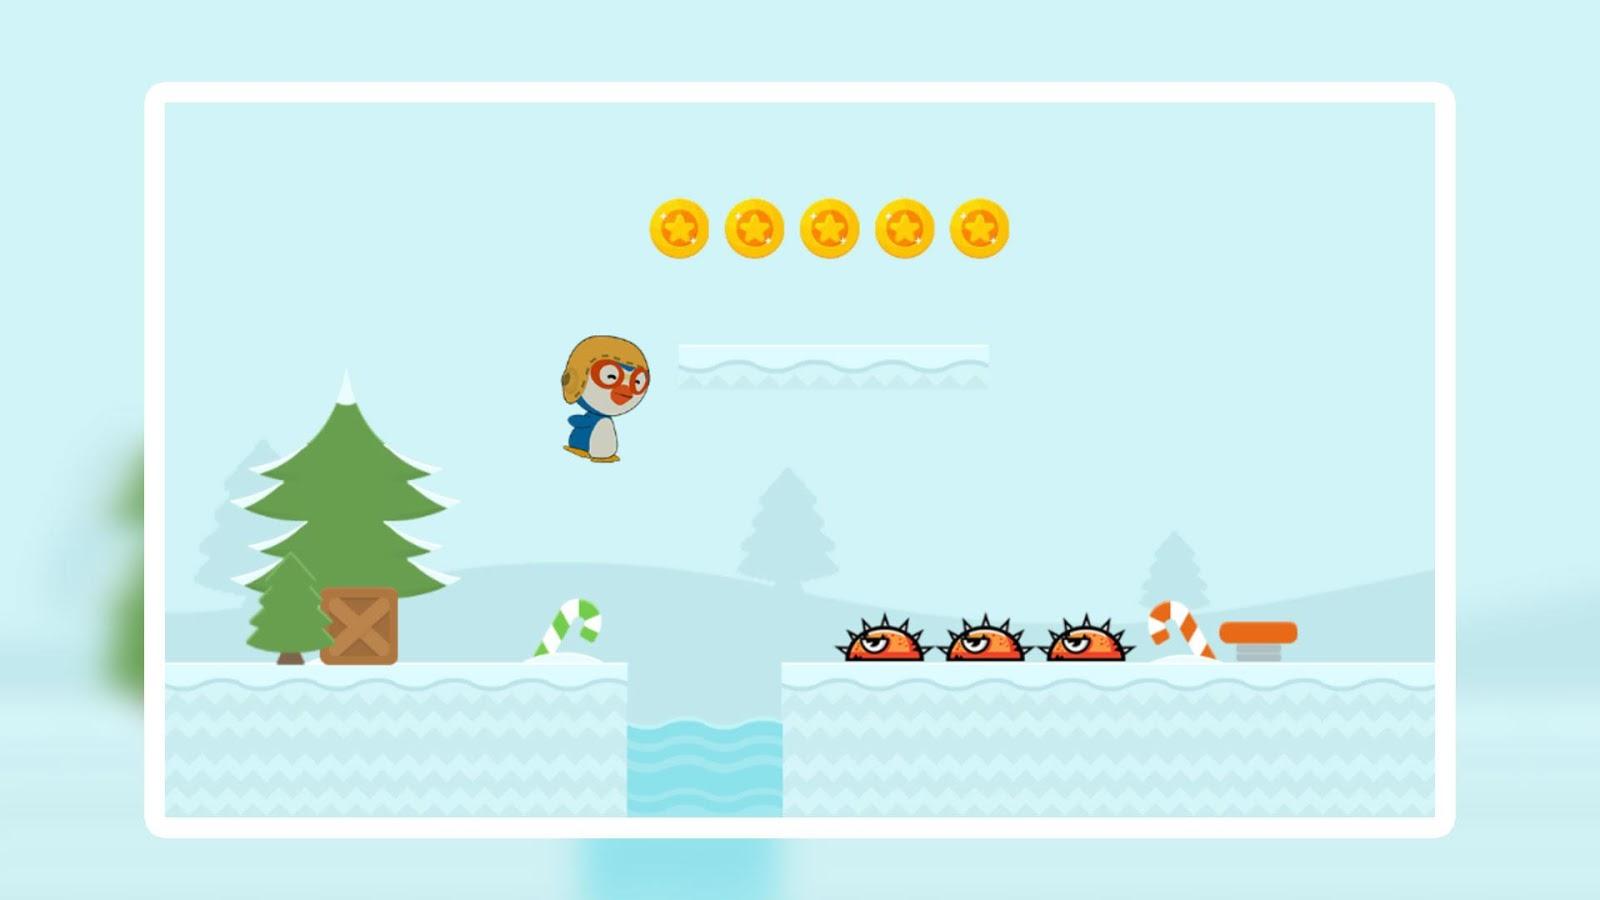 Pororo Run And Slide 2 11 Apk Download Android Adventure Games Flipper Screenshot 1